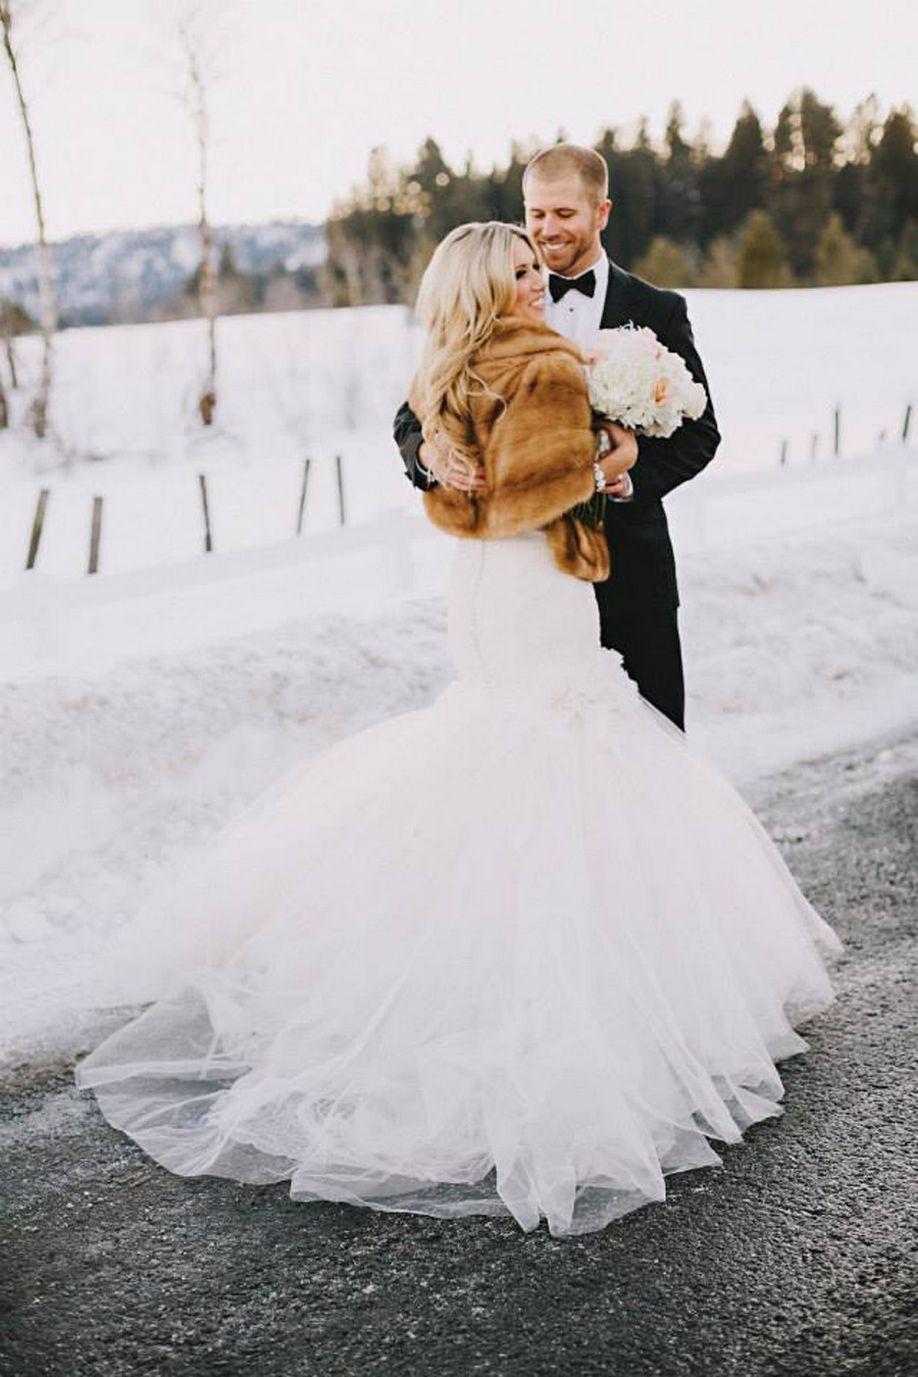 100+ Amazing Wedding Dresses Styles for Winter Wonderland Weddings